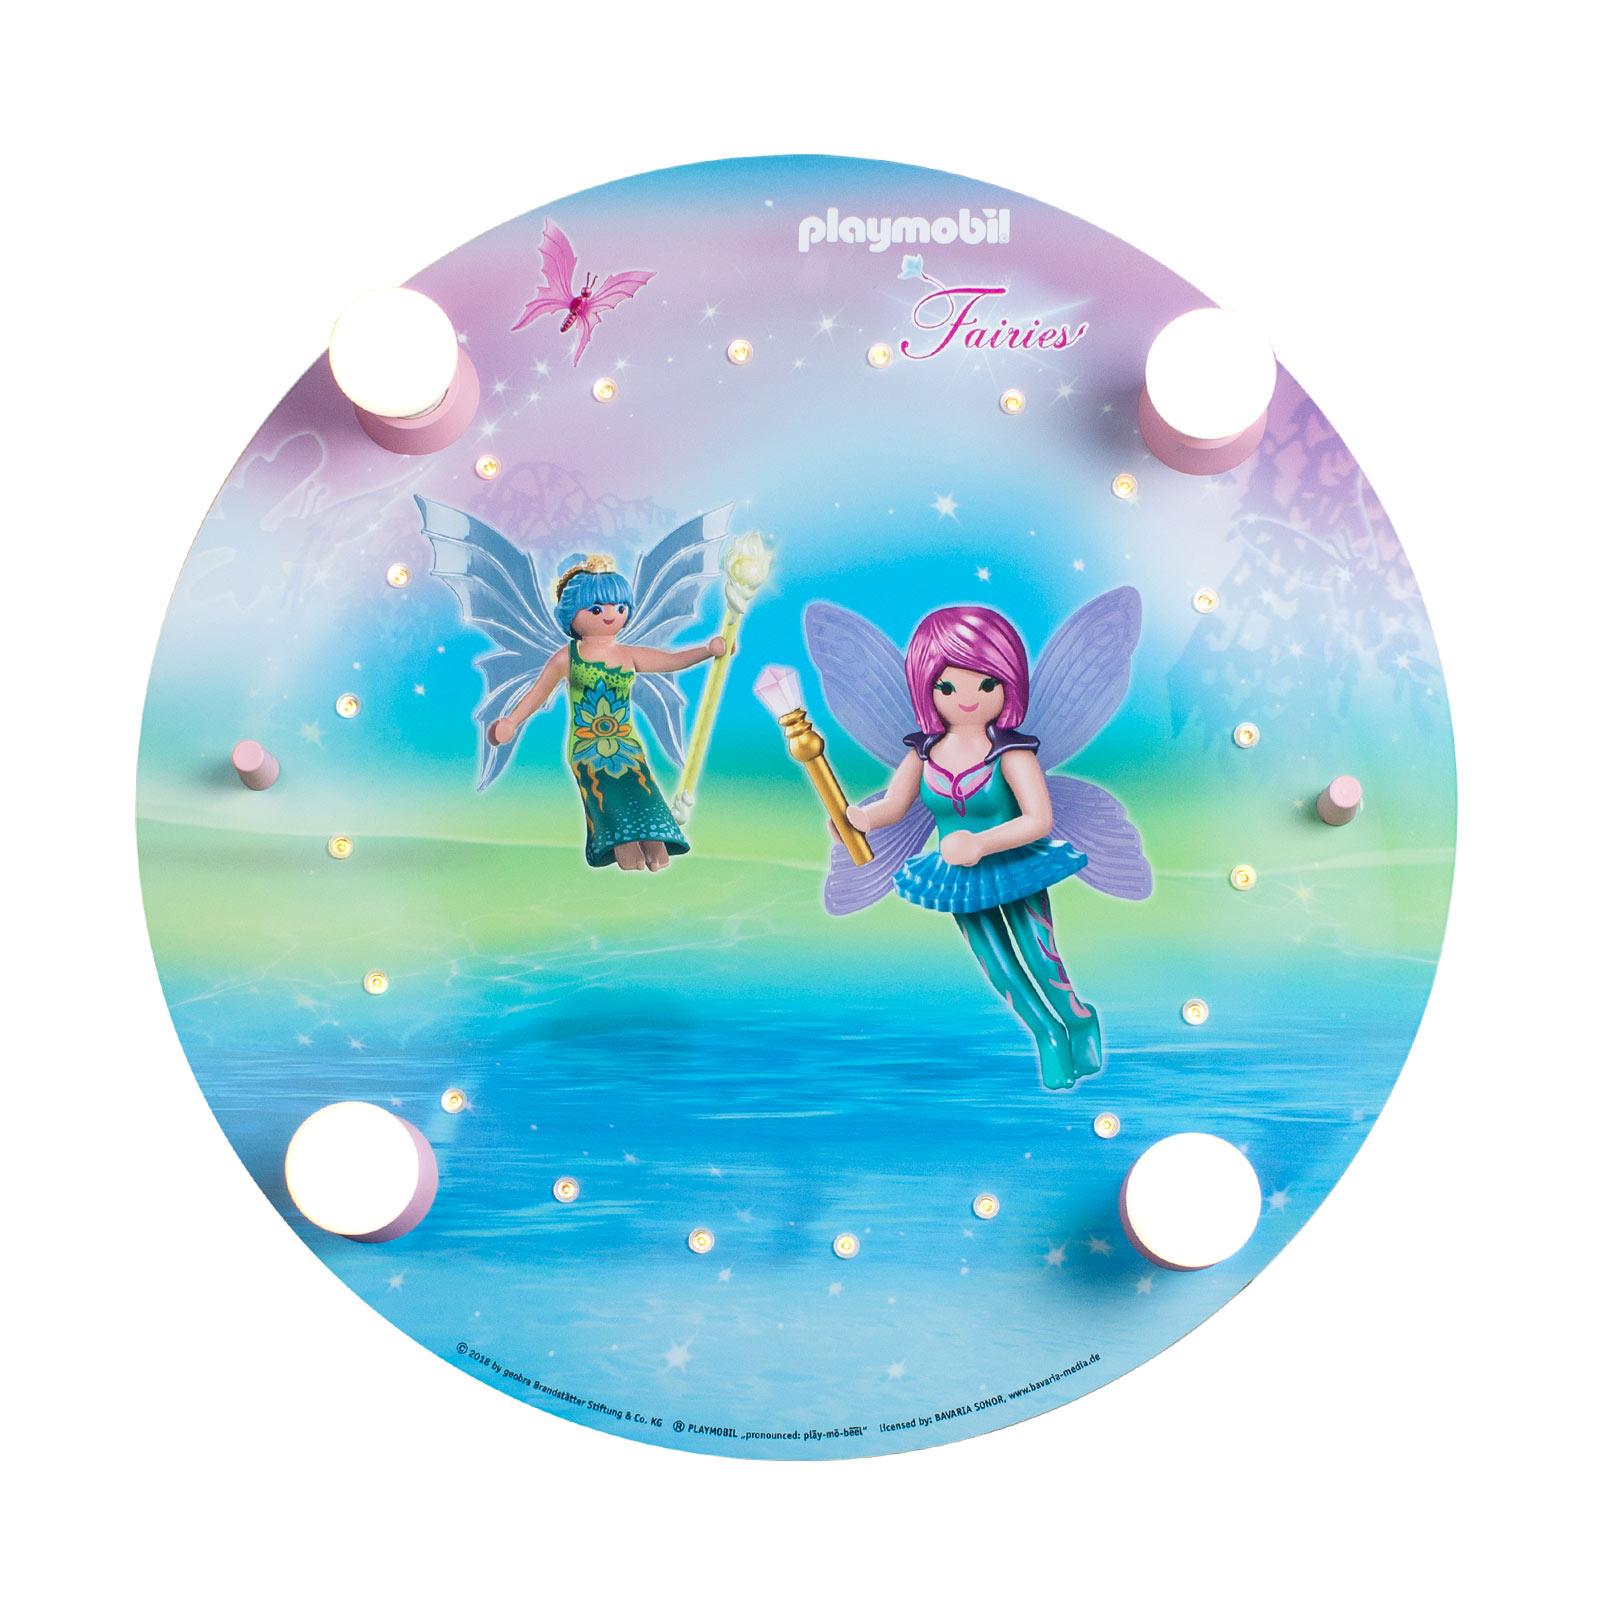 Taklampe Rondell PLAYMOBILE Fairies